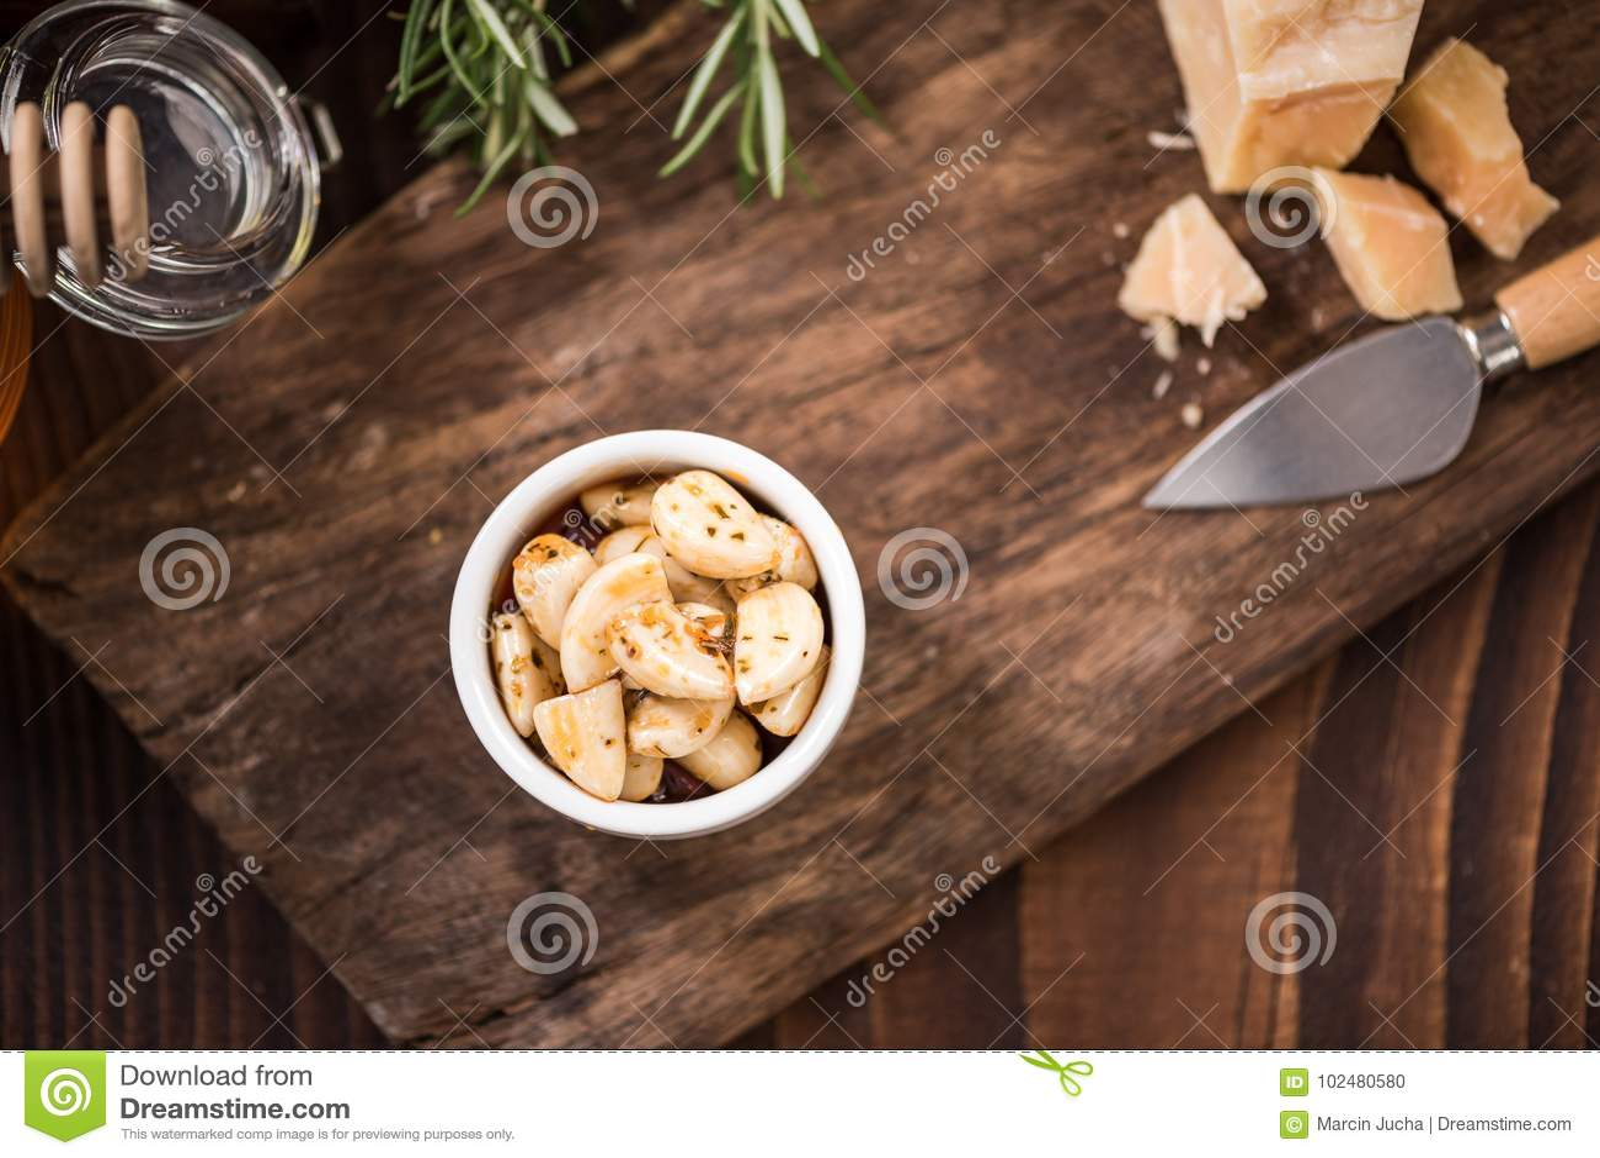 Spicy Garlic Cloves In Bowl,spanish Tapa Bar Food Stock Photo ...